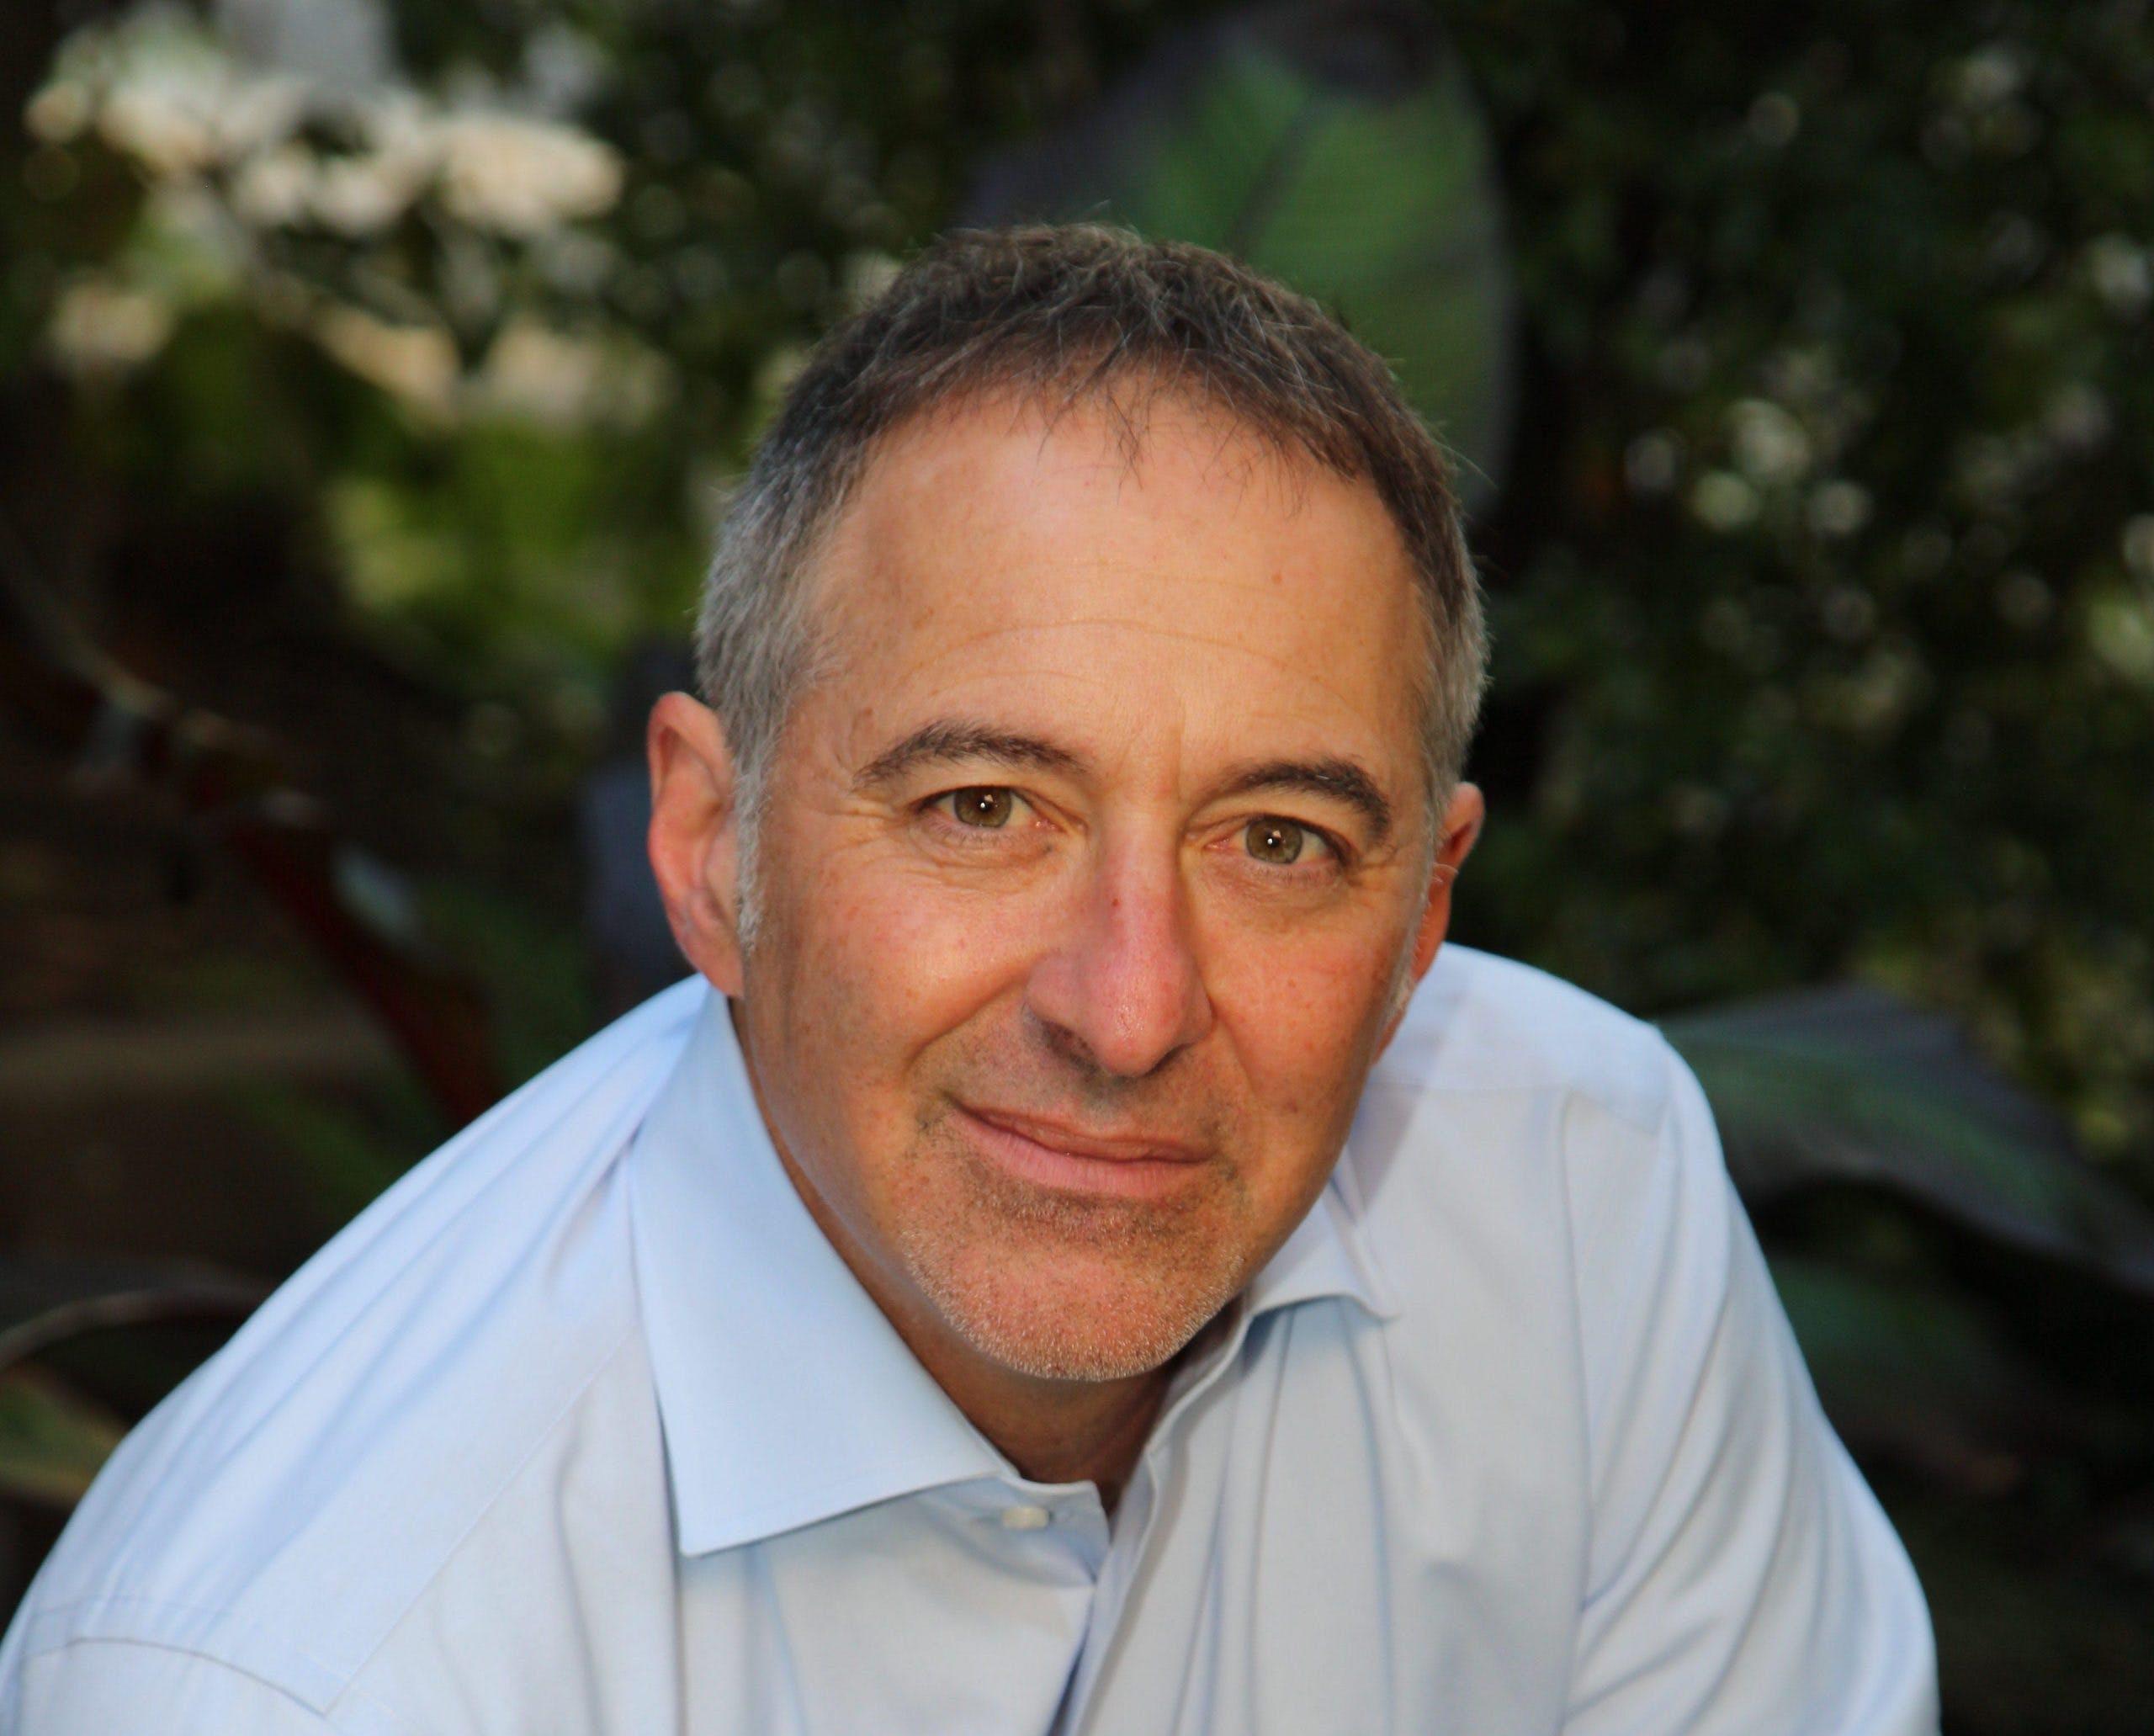 Matt Richtel, author of An Elegant Defense